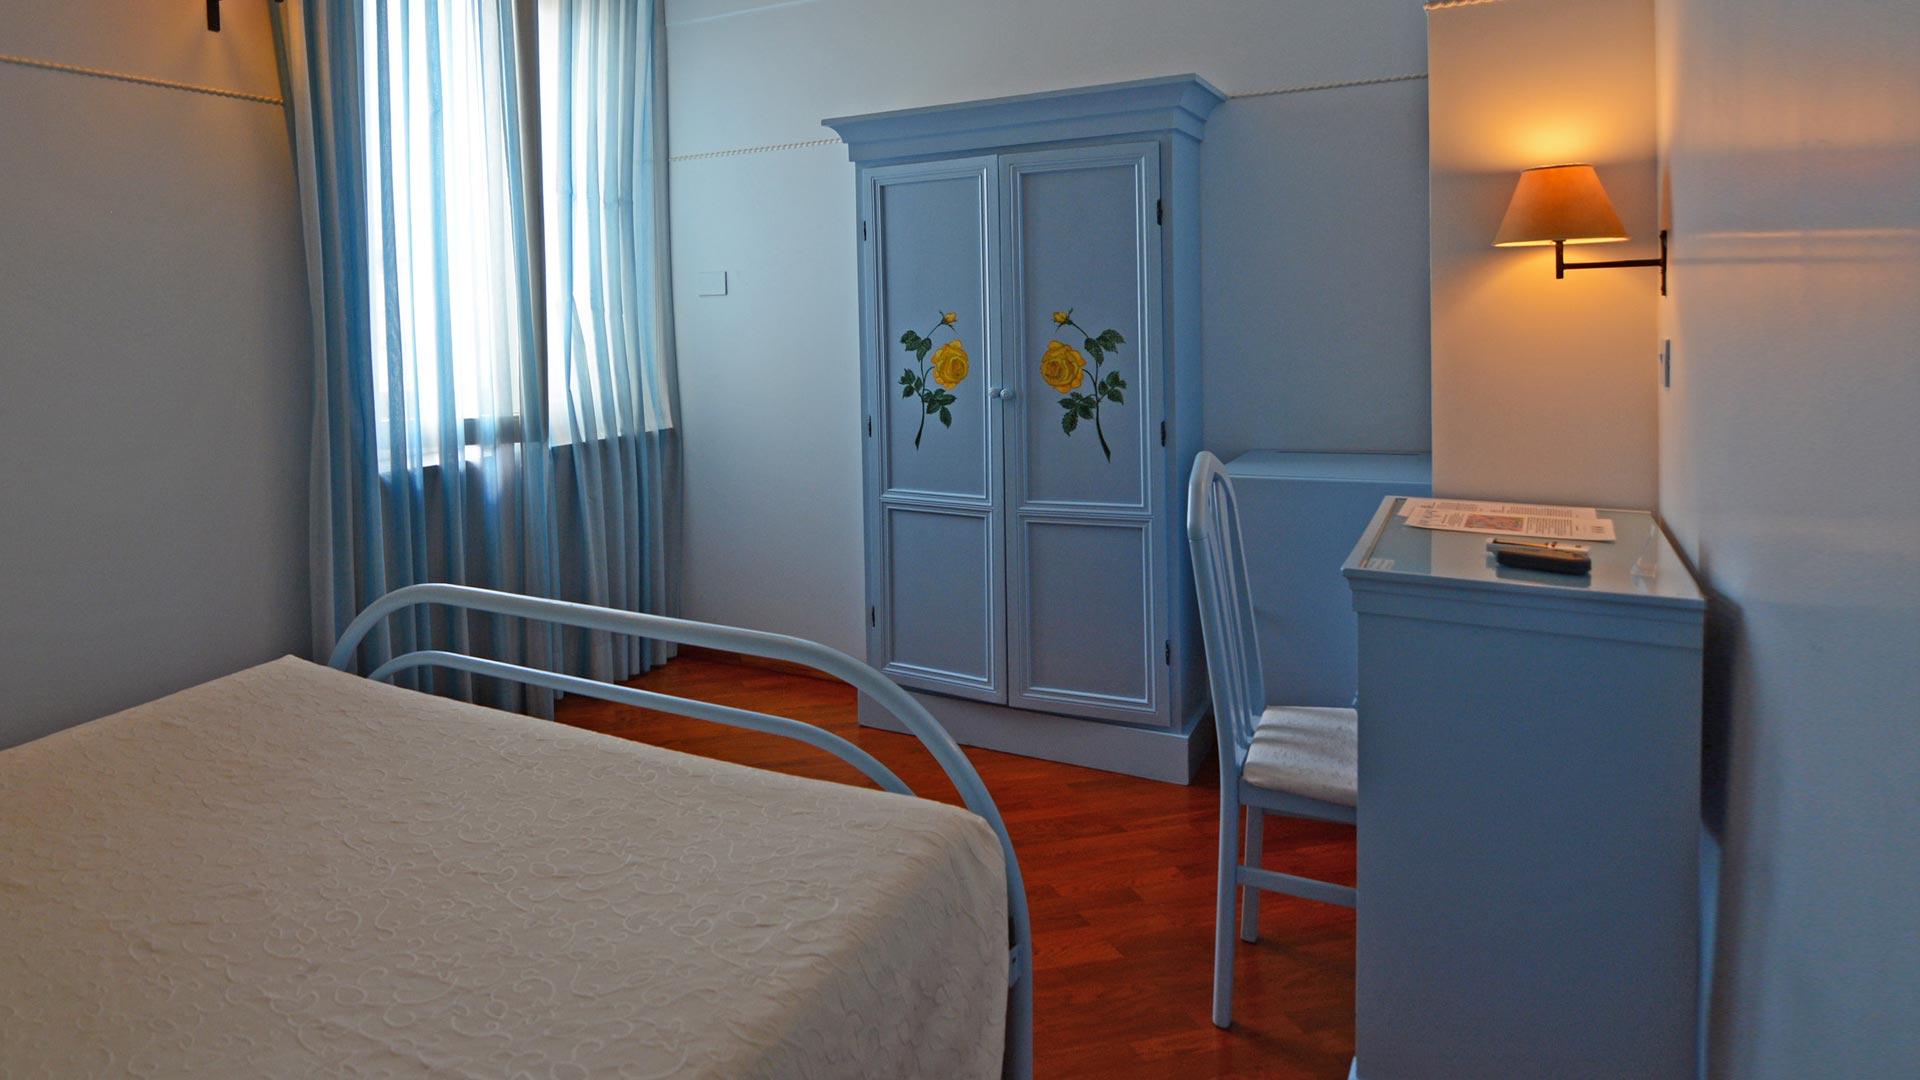 lilium-hotel-roma-30a